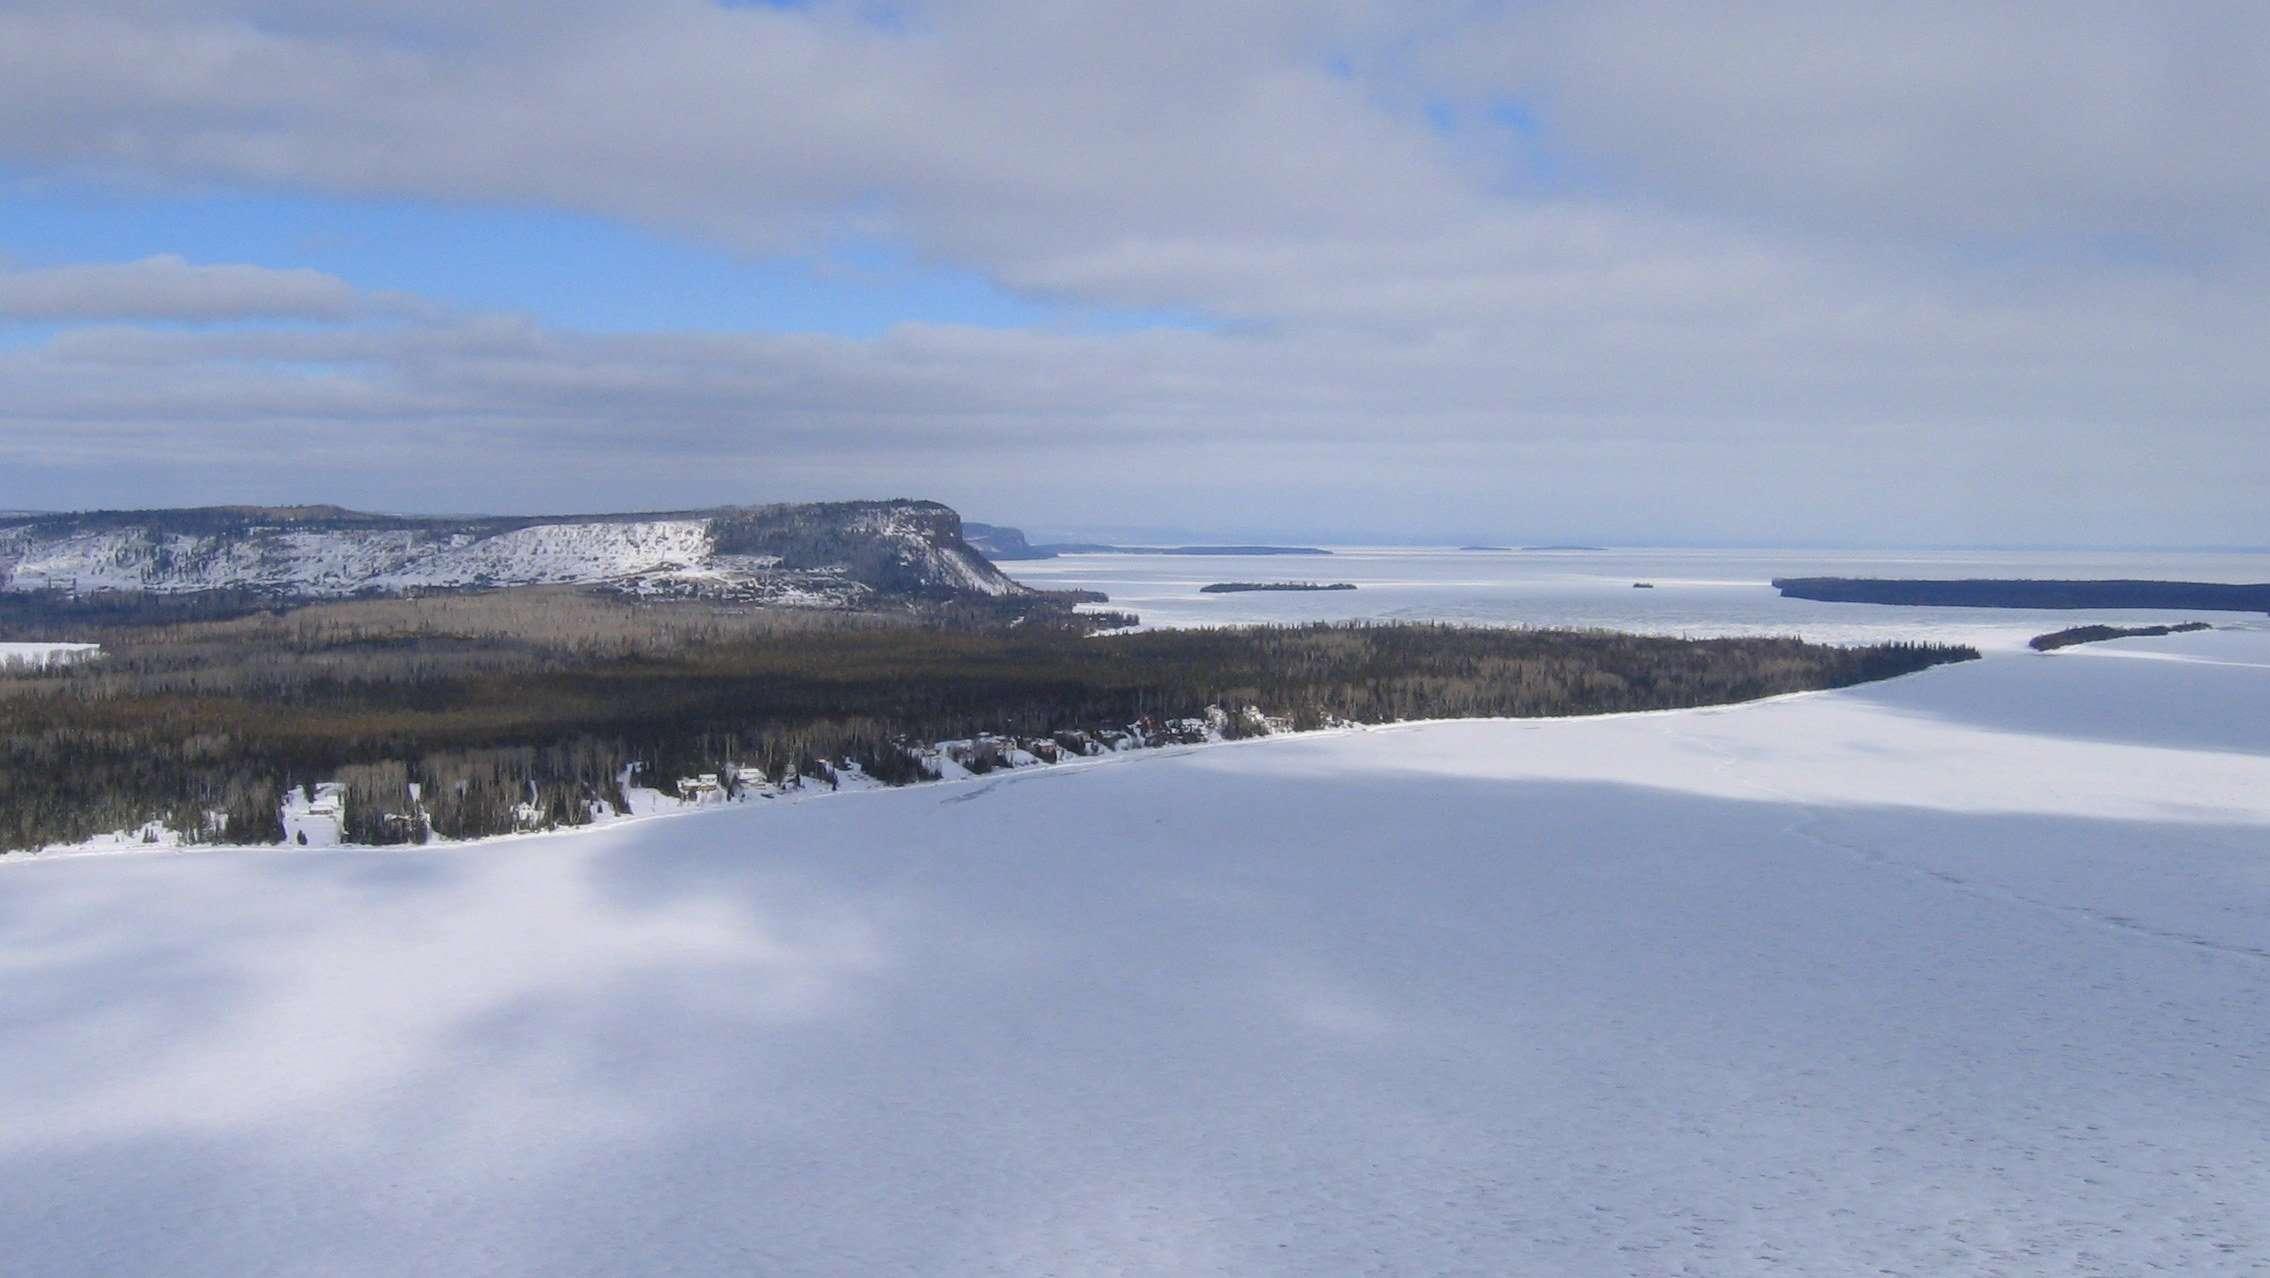 Mink mountain trail